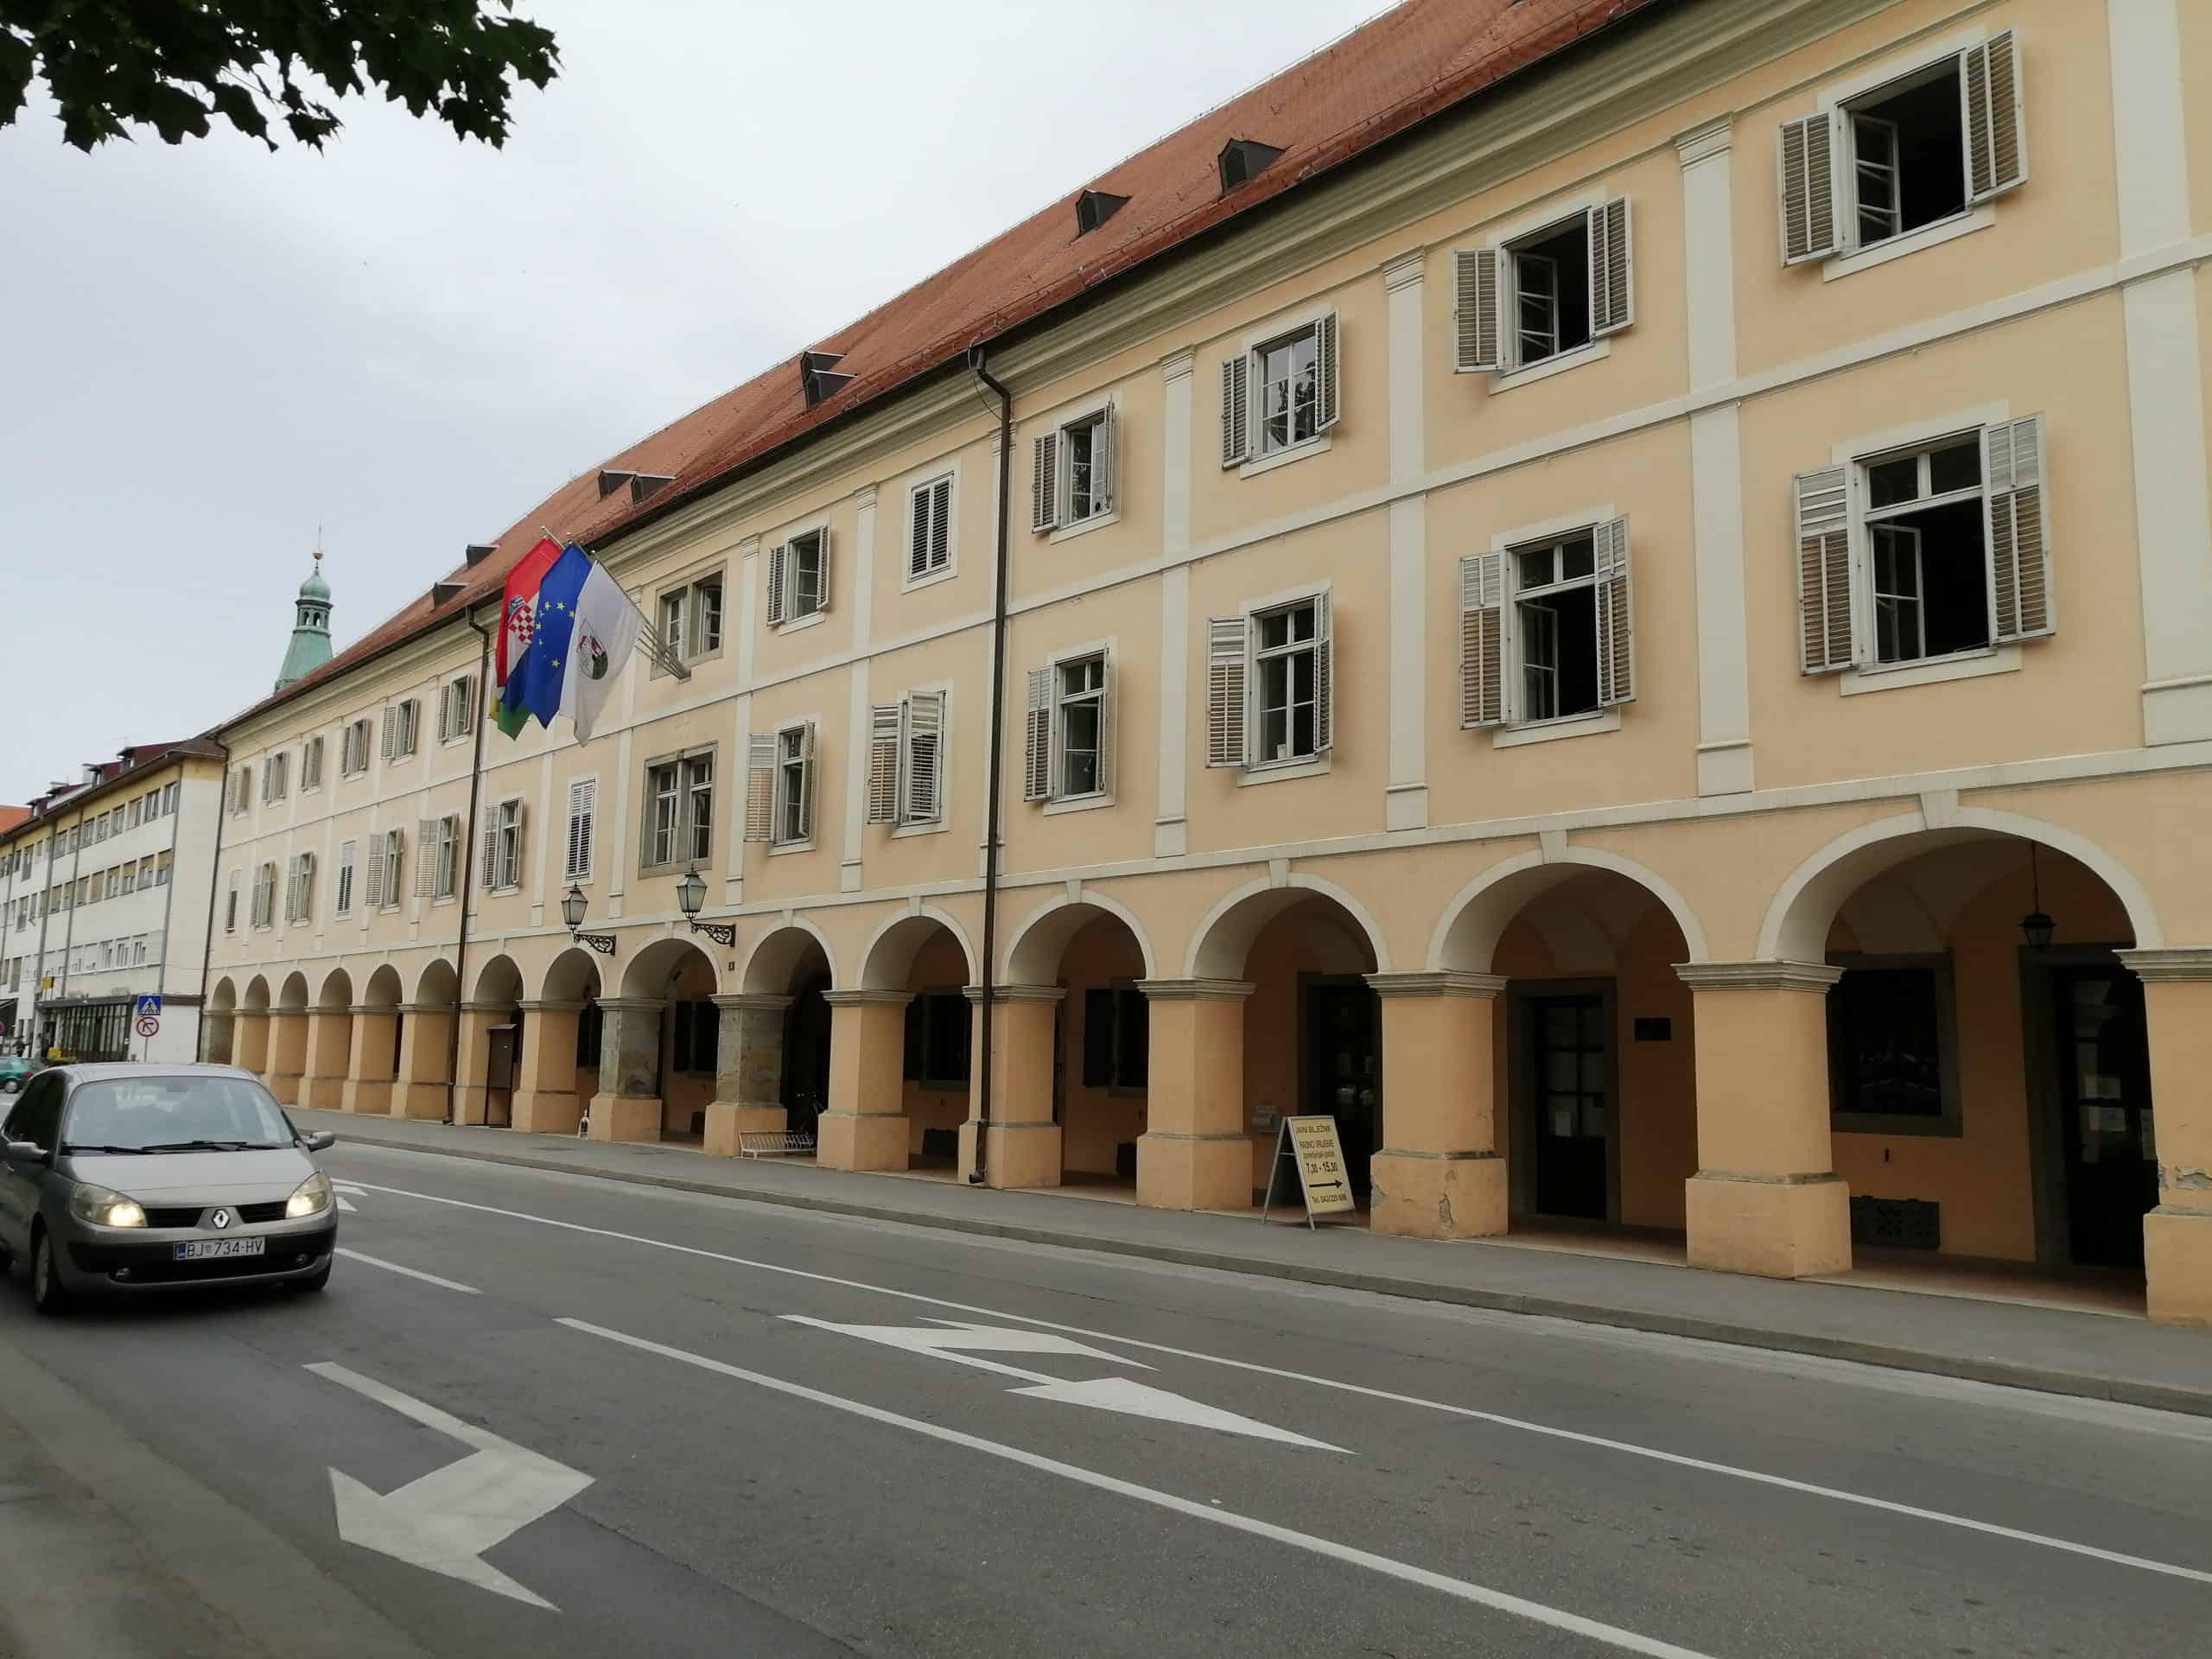 VRAĆANJE U NORMALU Otvorena bjelovarska gradska blagajna